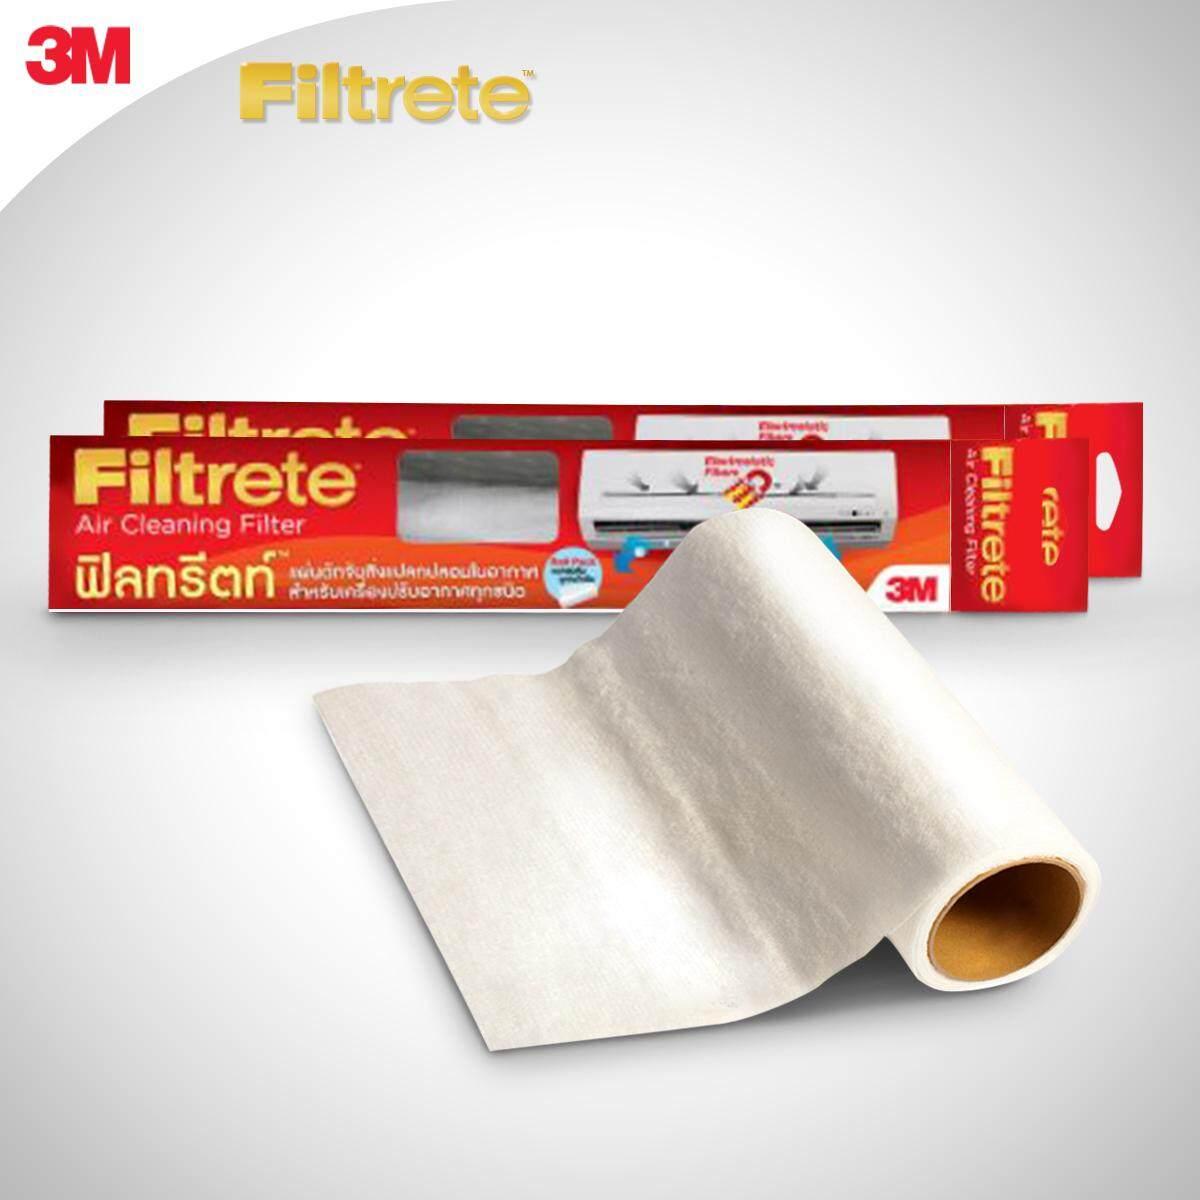 "Filtrete Roll 15x96"" Pack 9808 แผ่นดักจับสิ่งแปลกปลอมในอากาศ ฟิลทรีตท์ 15 X 96"" By 3m Official Online Store"